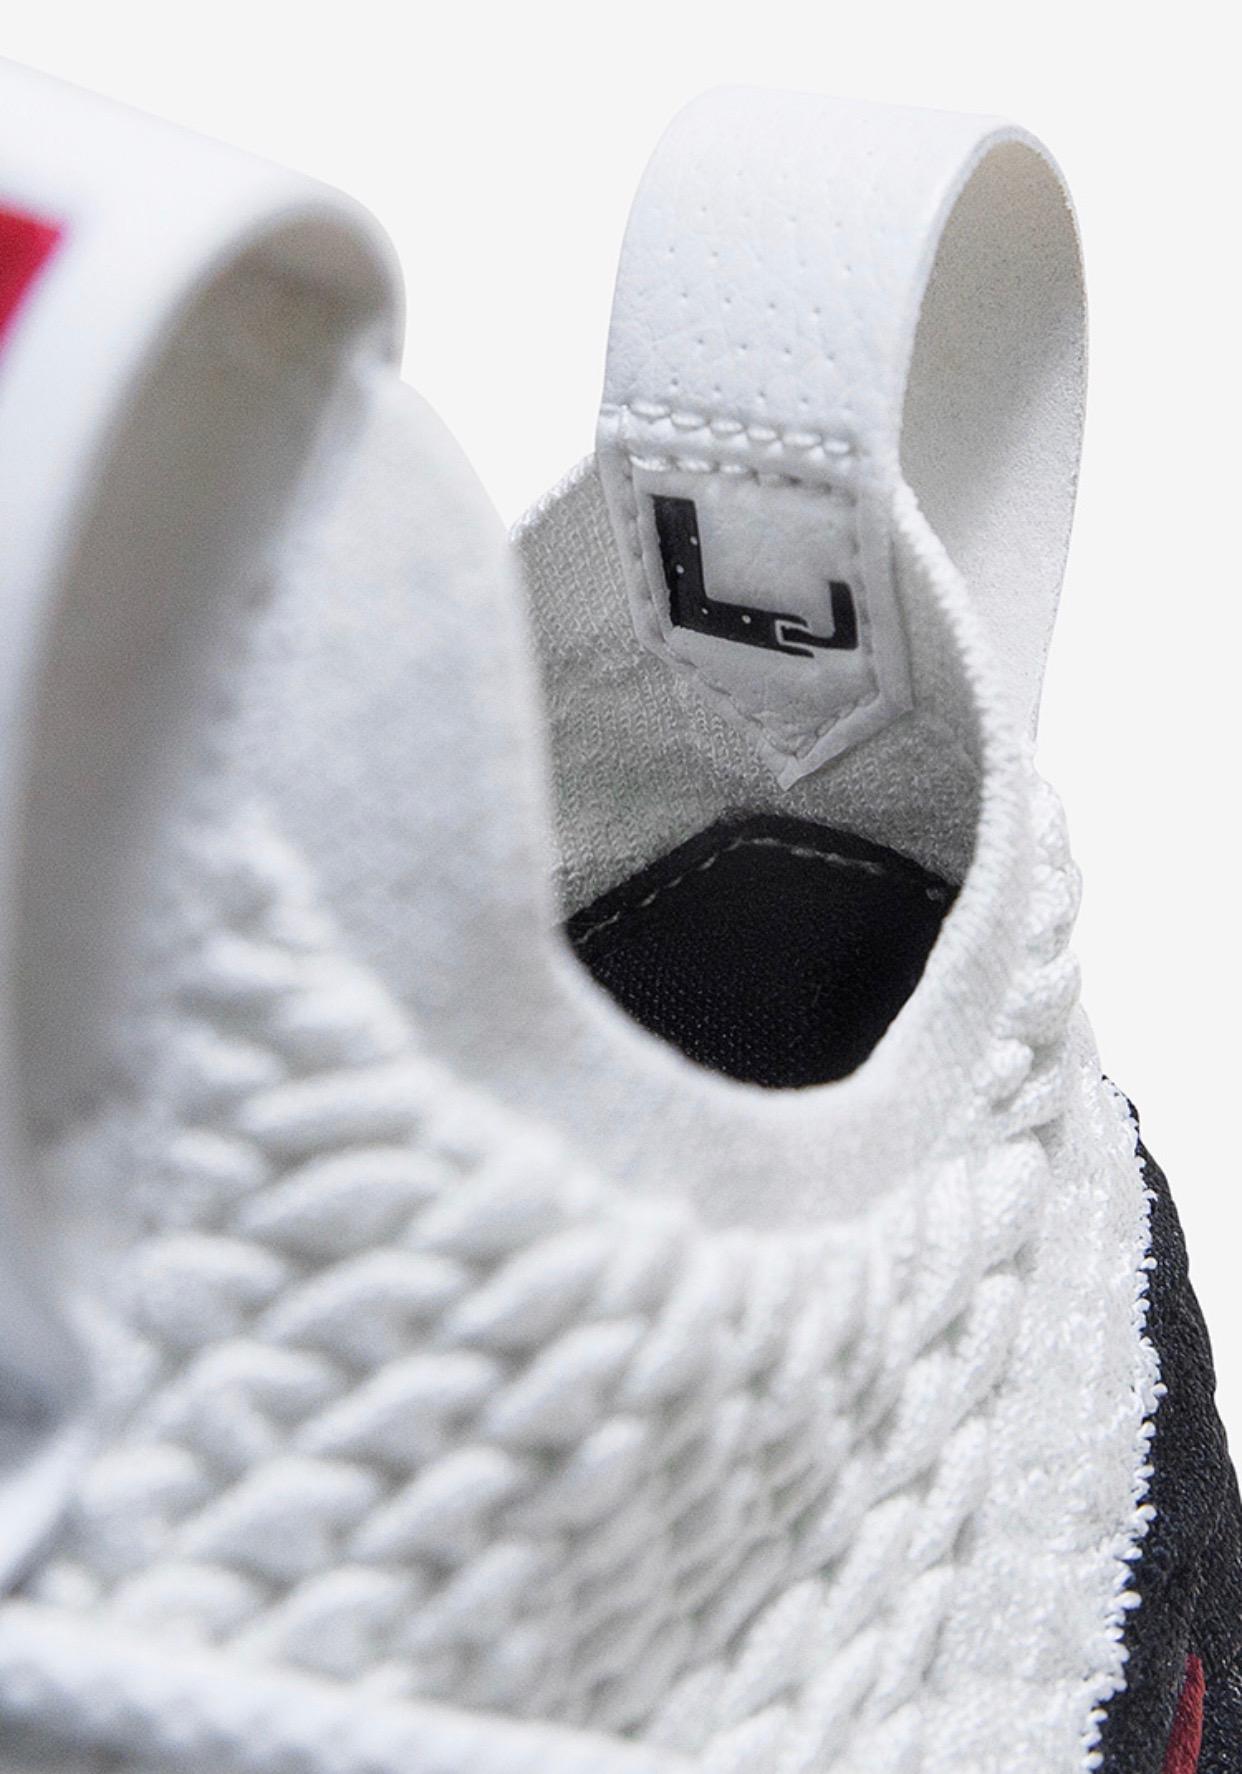 new arrival dea6c 24cb9 LeBron James Rocked the Nike LeBron 15 'Air Zoom Generation ...